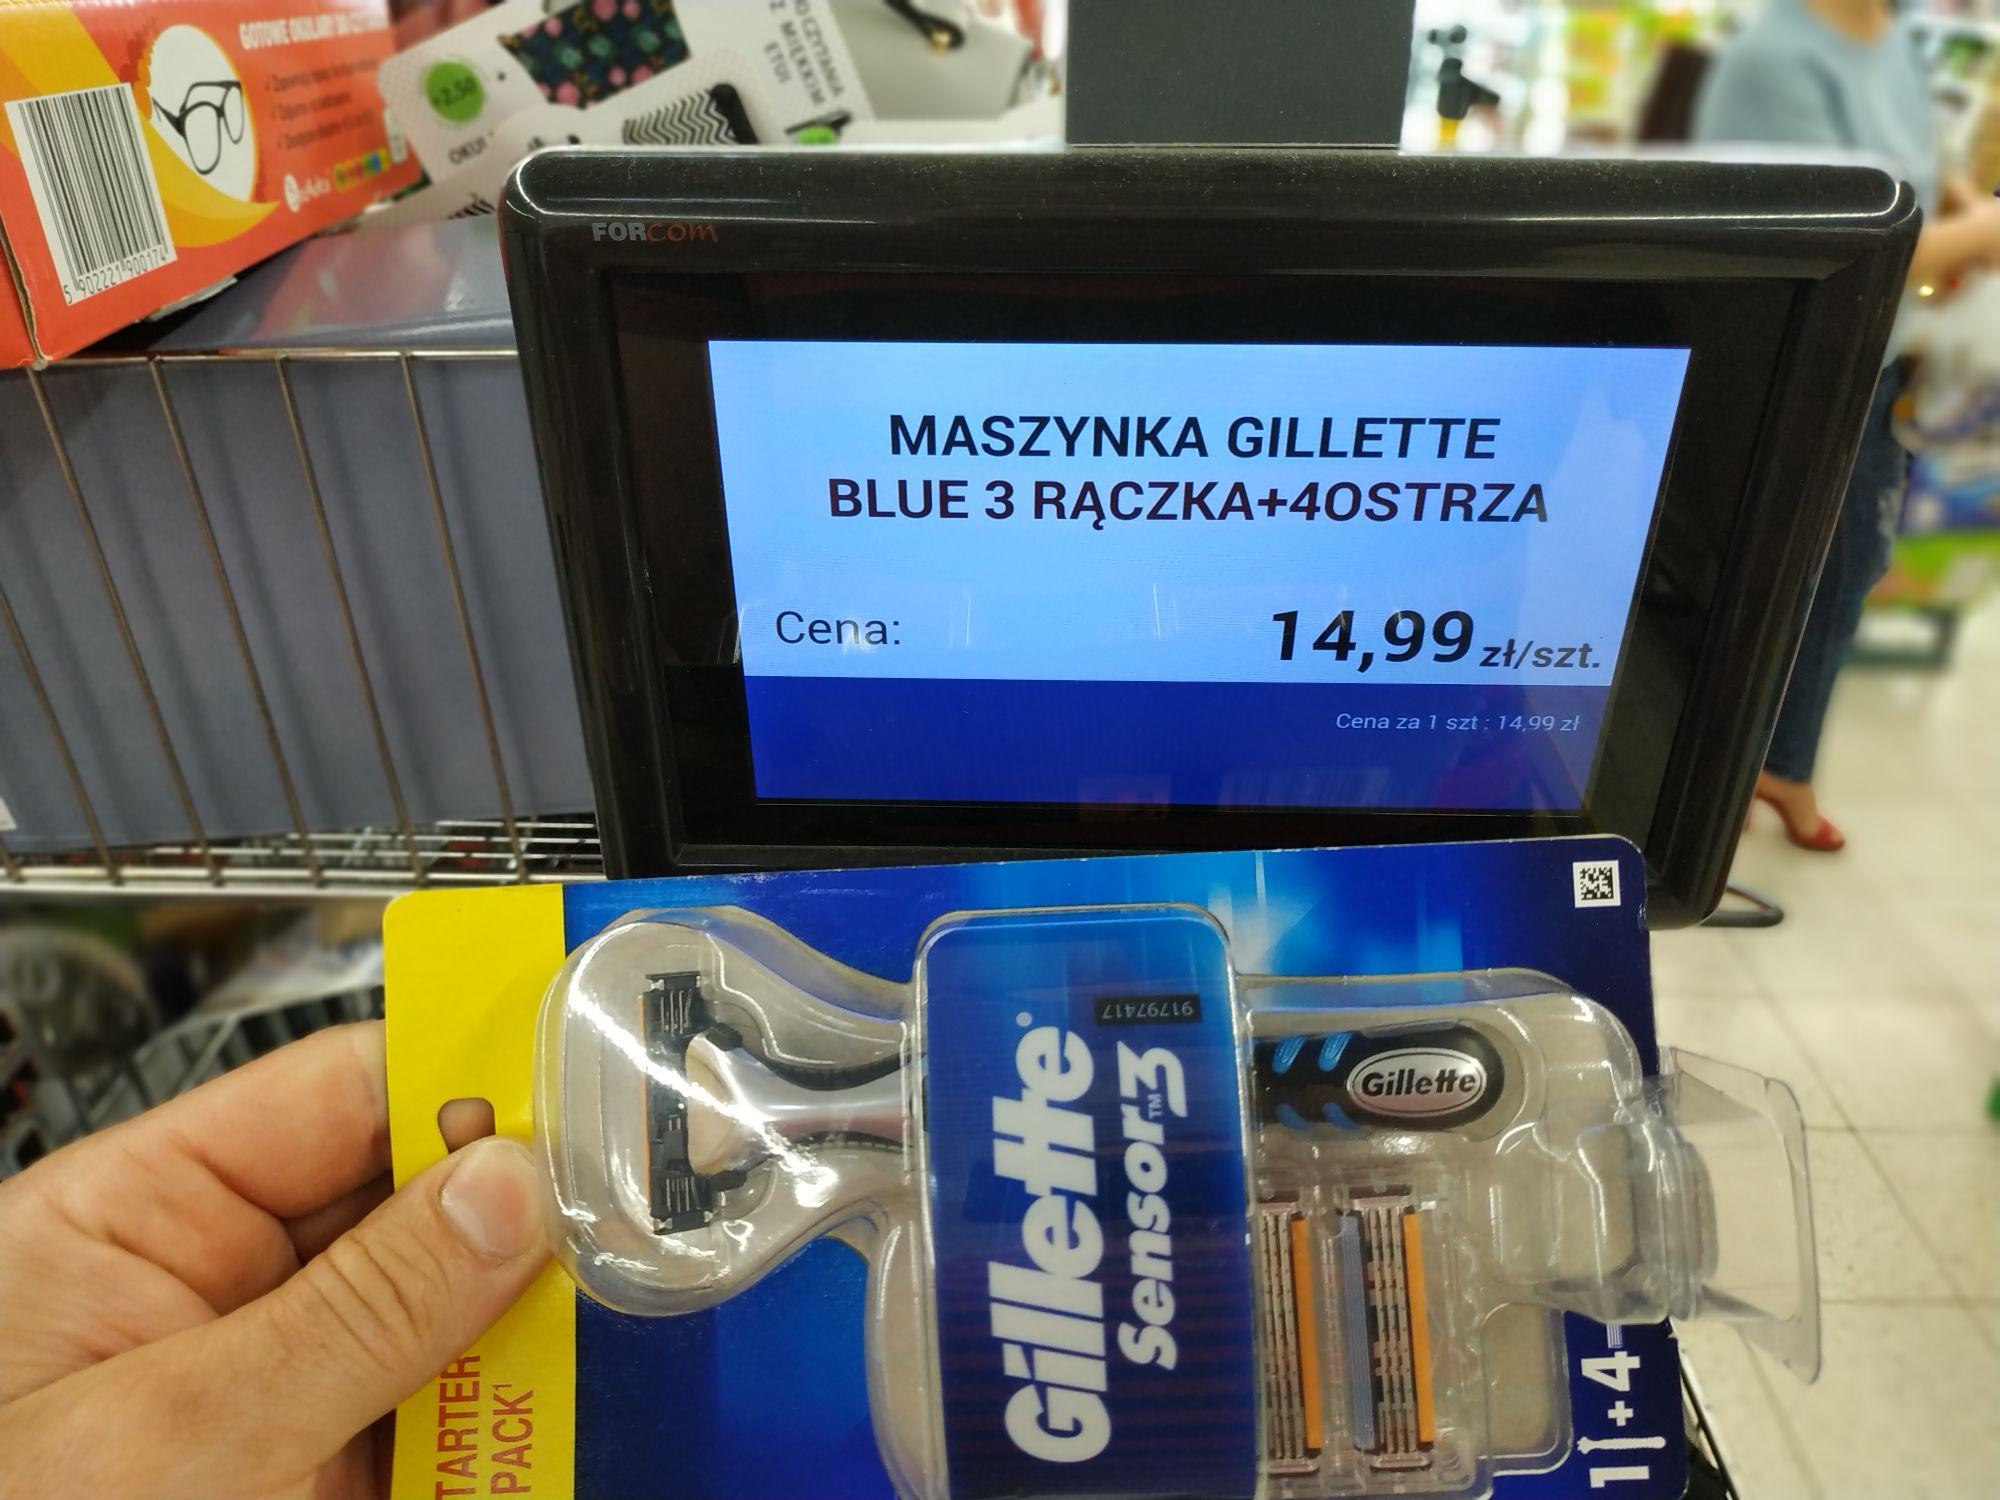 Gillette sensor 3 Biedronka